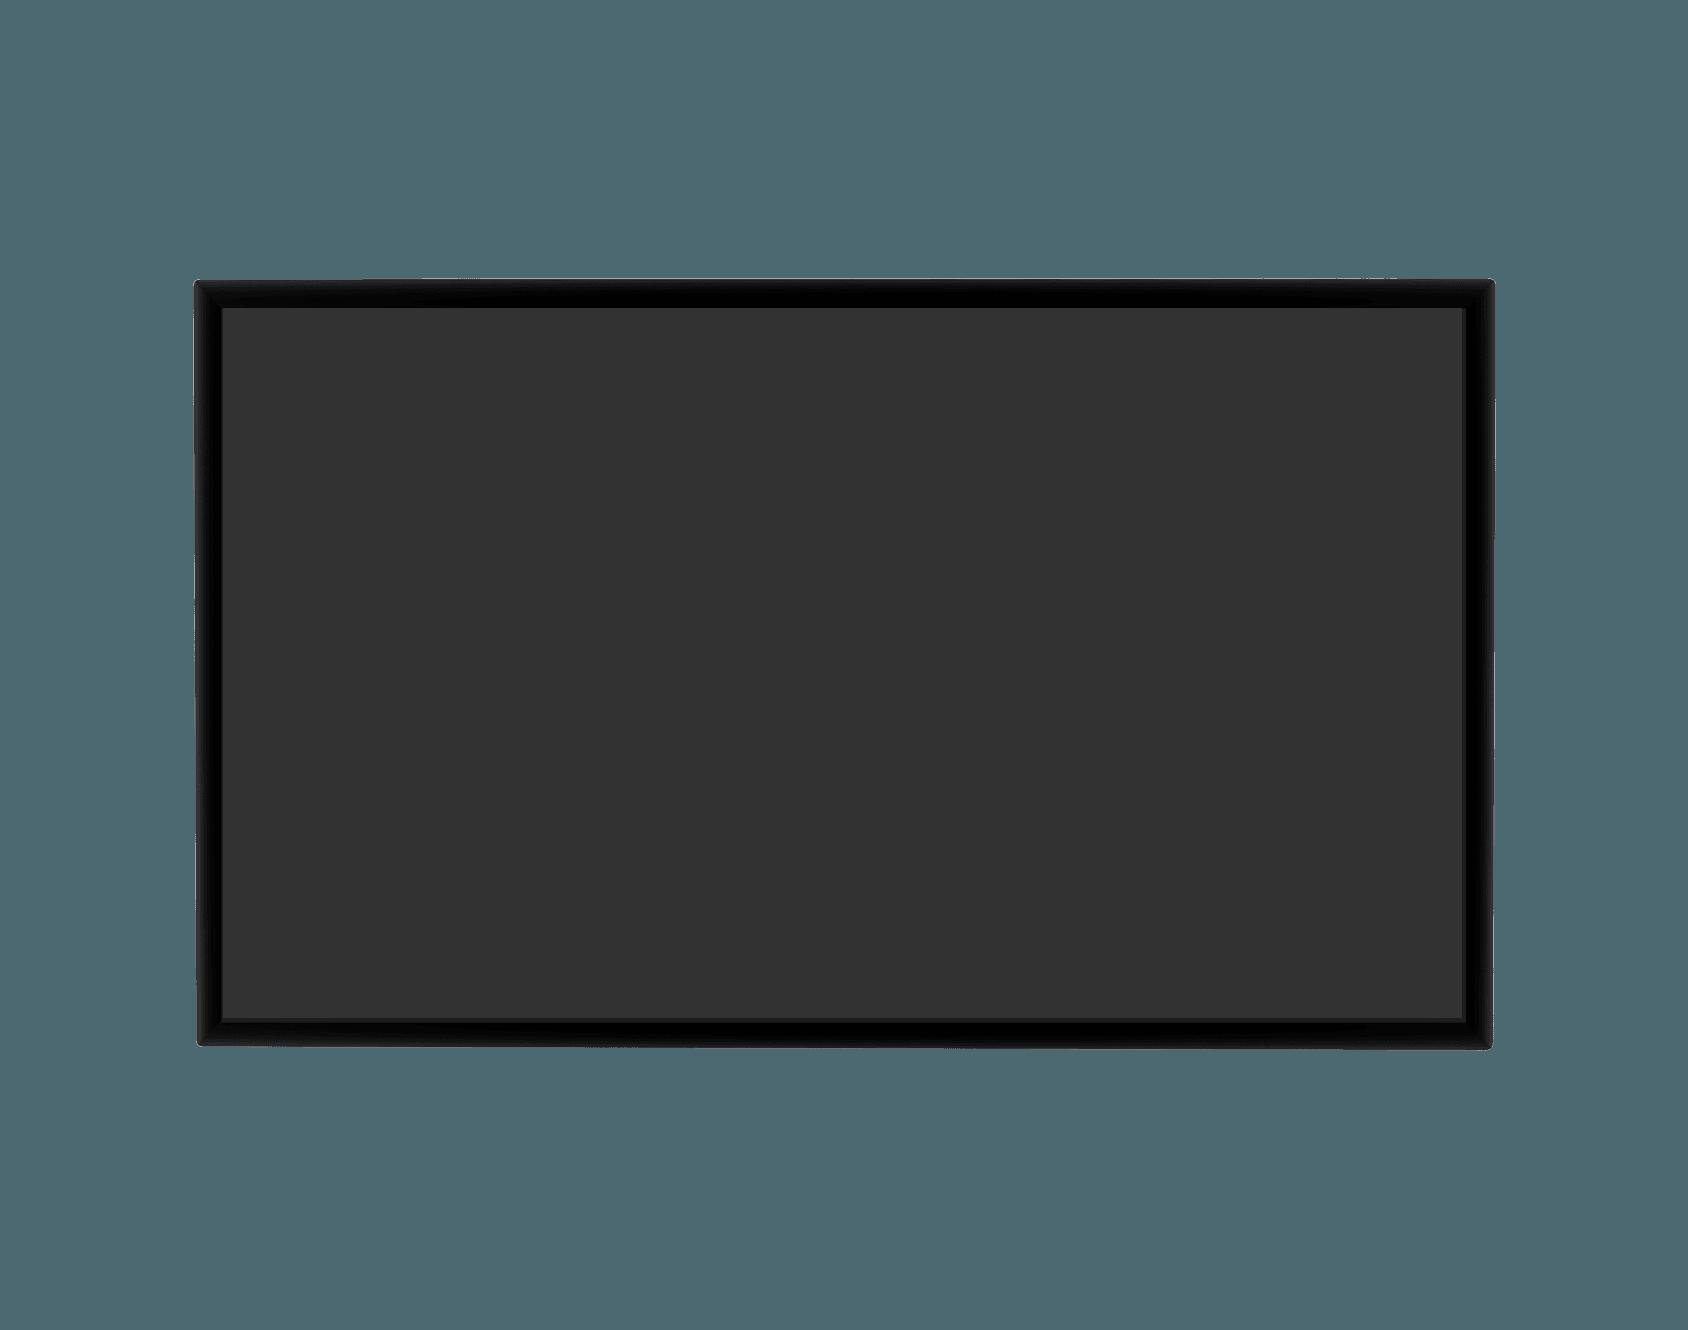 Vidi-Touch LITE 70 inch